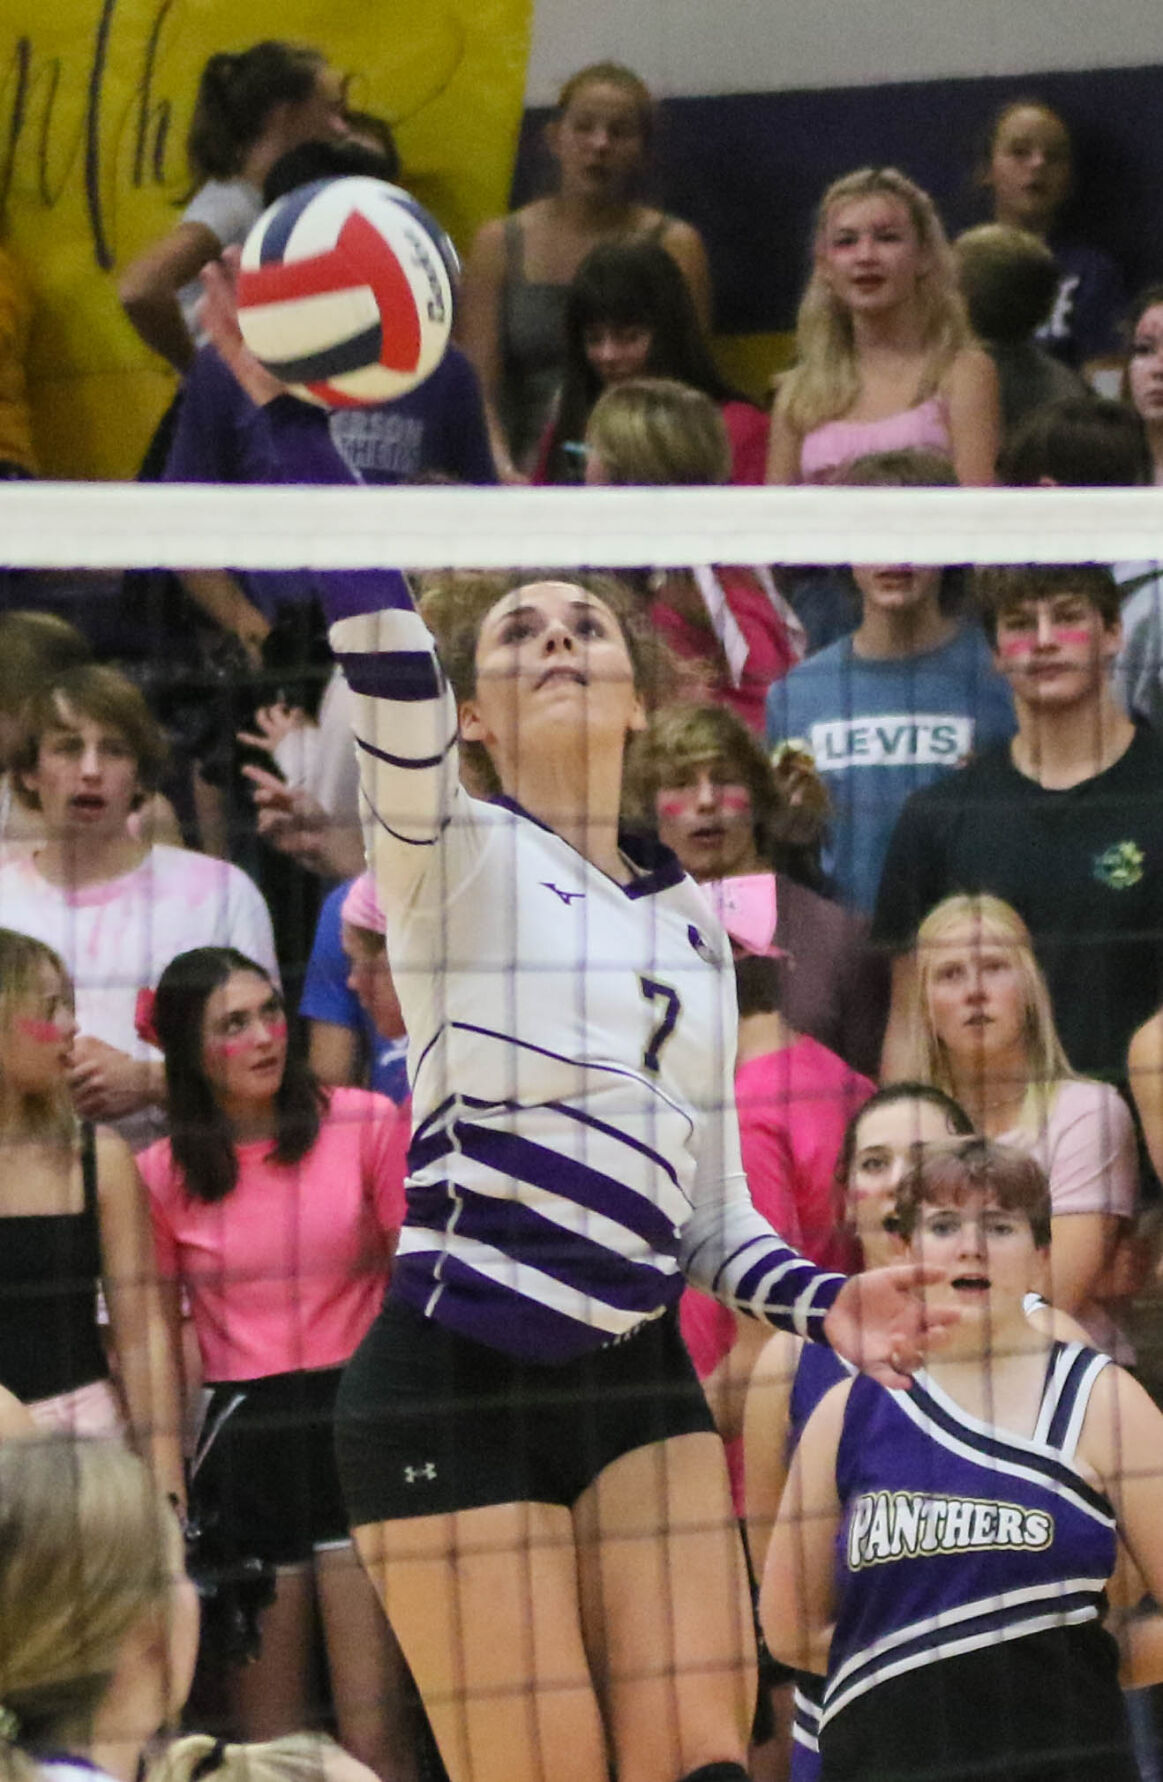 211013 PHOTO Volleyball ROSE JOHNSON - 3